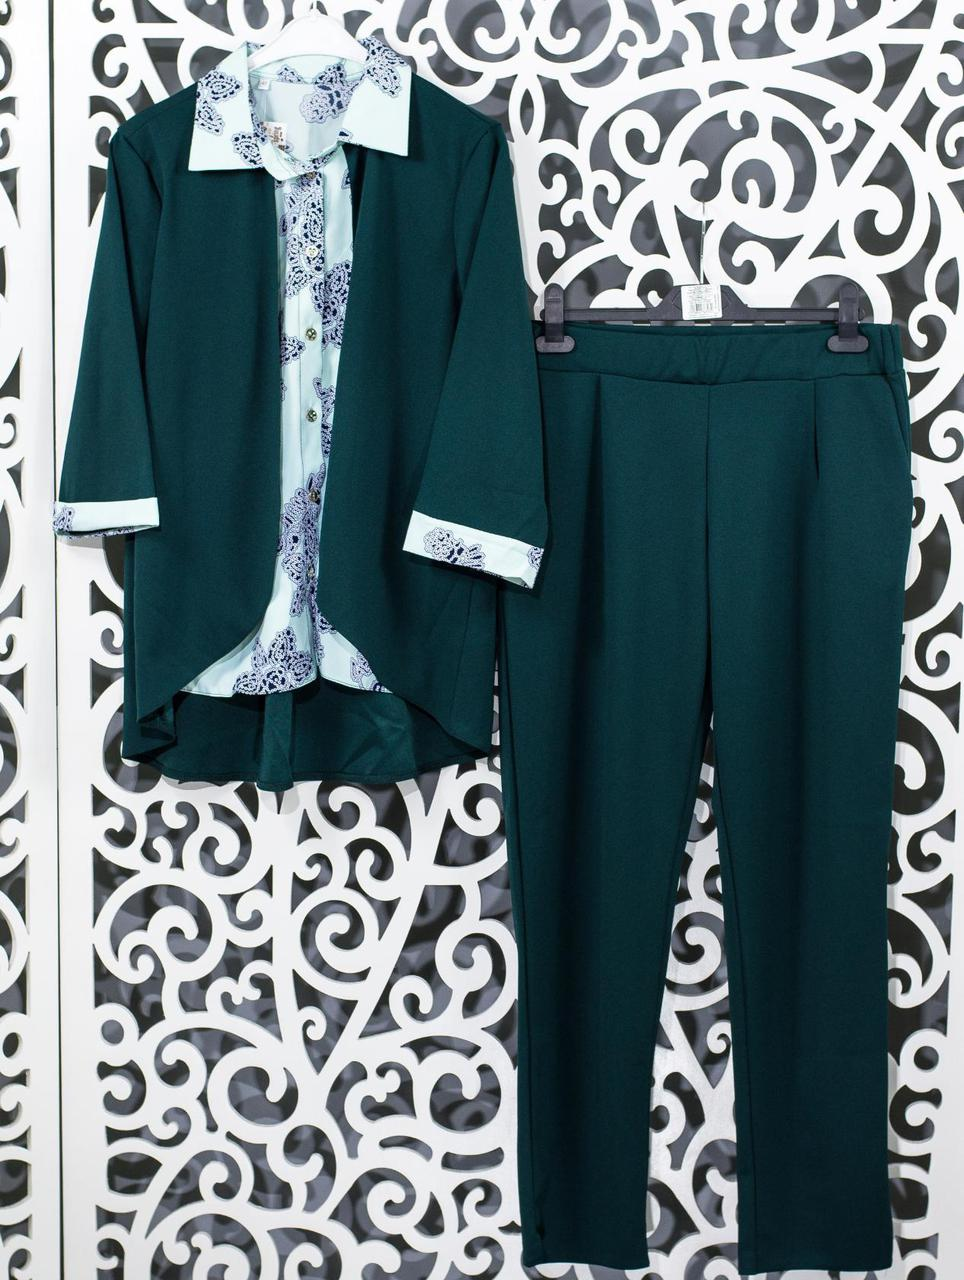 "Женский костюм-двойка r блуза с имитацией жакета и брючки  ""Креп-Дайвинг"" 48, 50, 52, 54 размер батал"